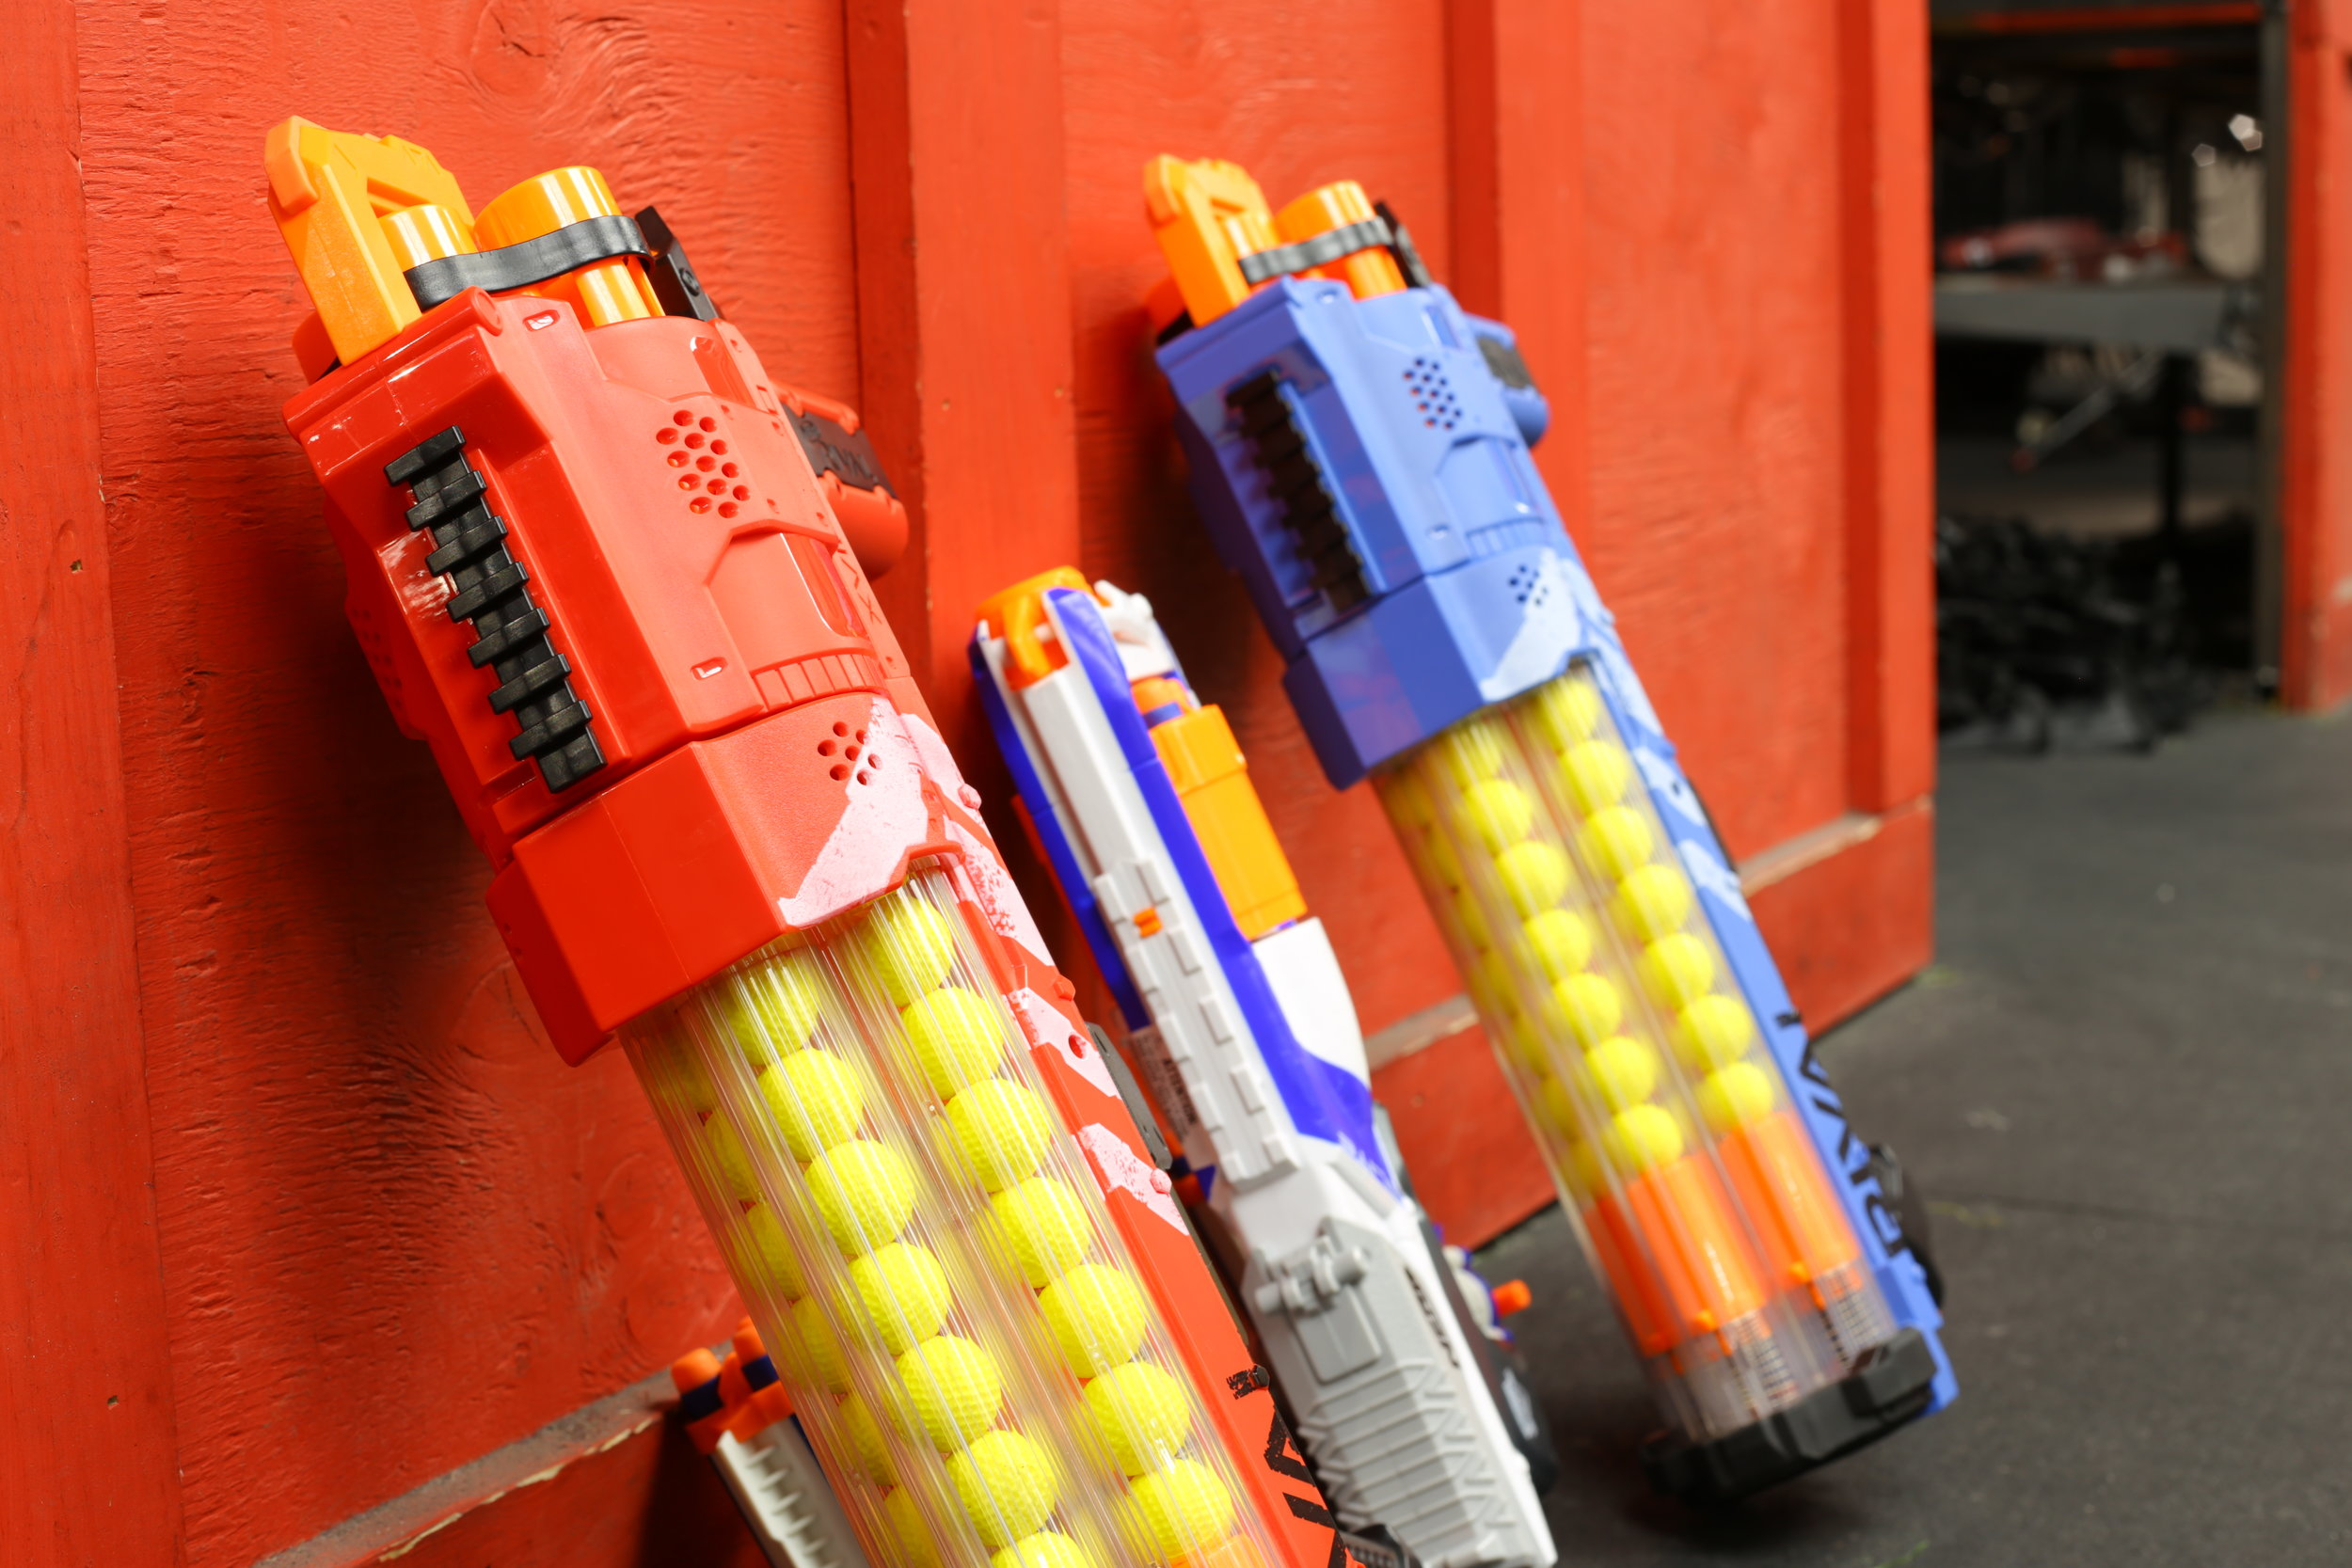 toronto nerf wars red rival blue Elite Ex-3 archers arena nerf combat battle.JPG